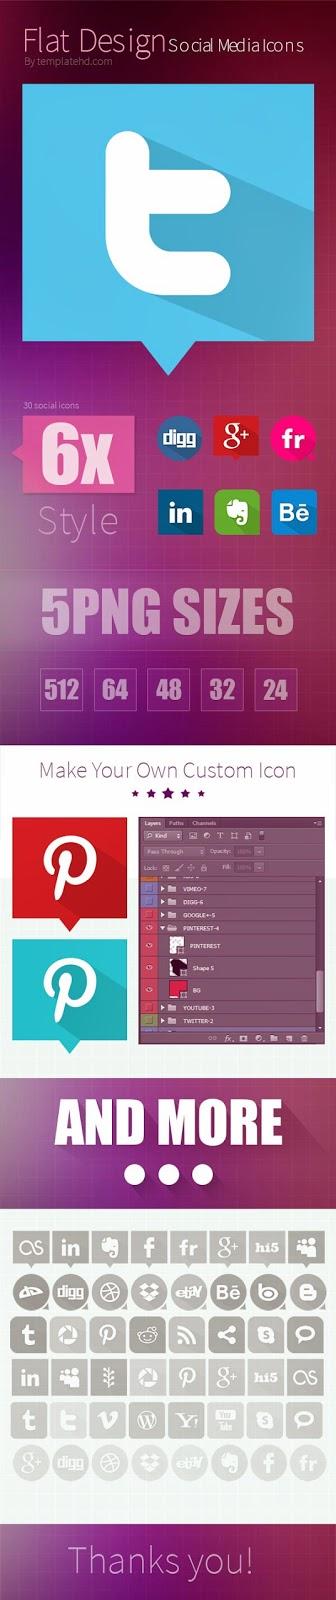 30 Social Media Icons PSD Files